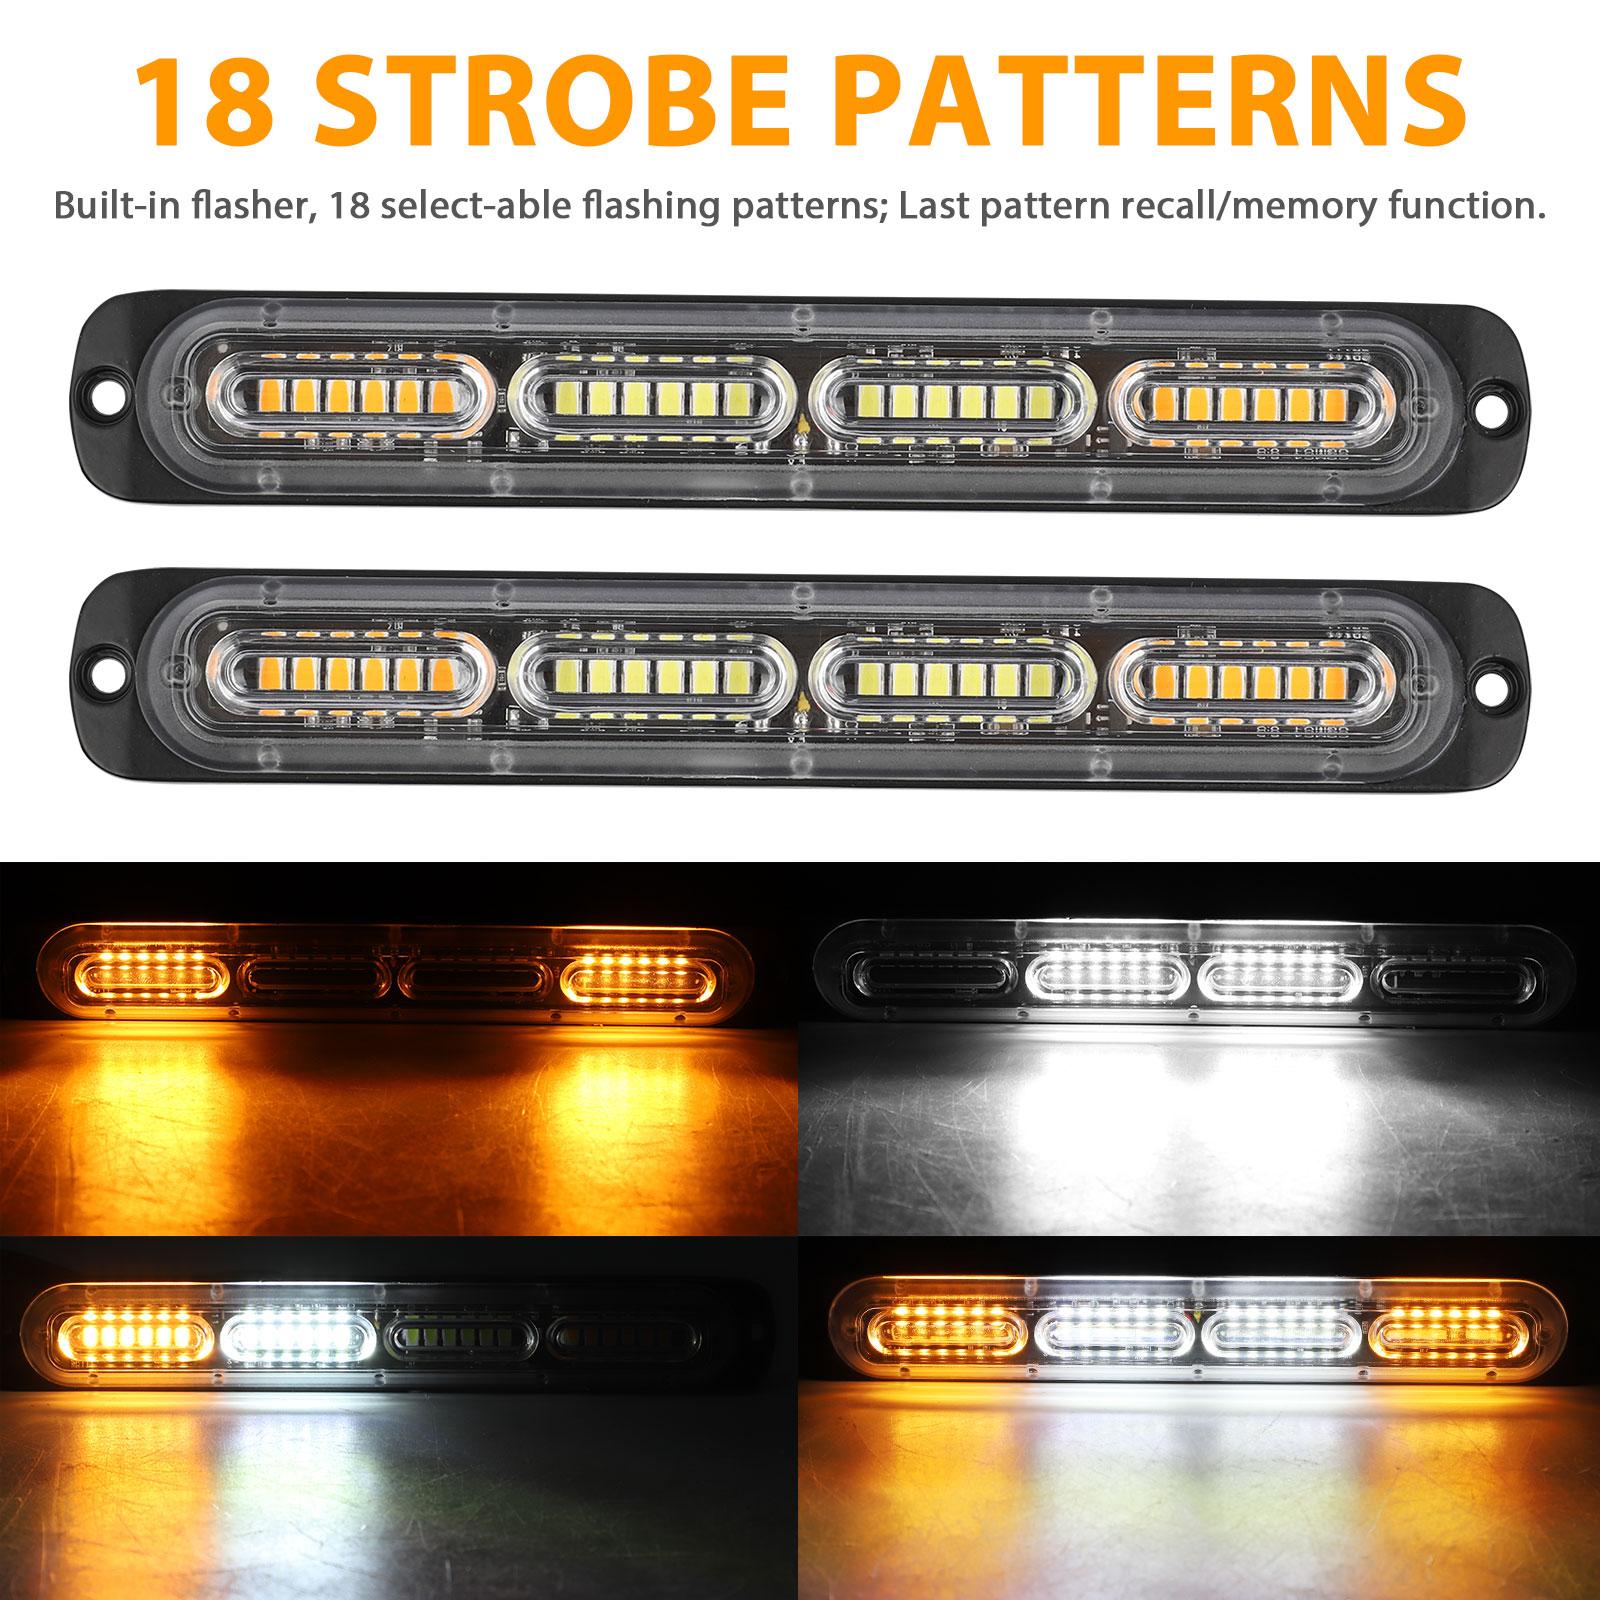 2PC-Amber-White-24LED-Car-Truck-Emergency-Warning-Hazard-Flash-Strobe-Light-Bar thumbnail 4